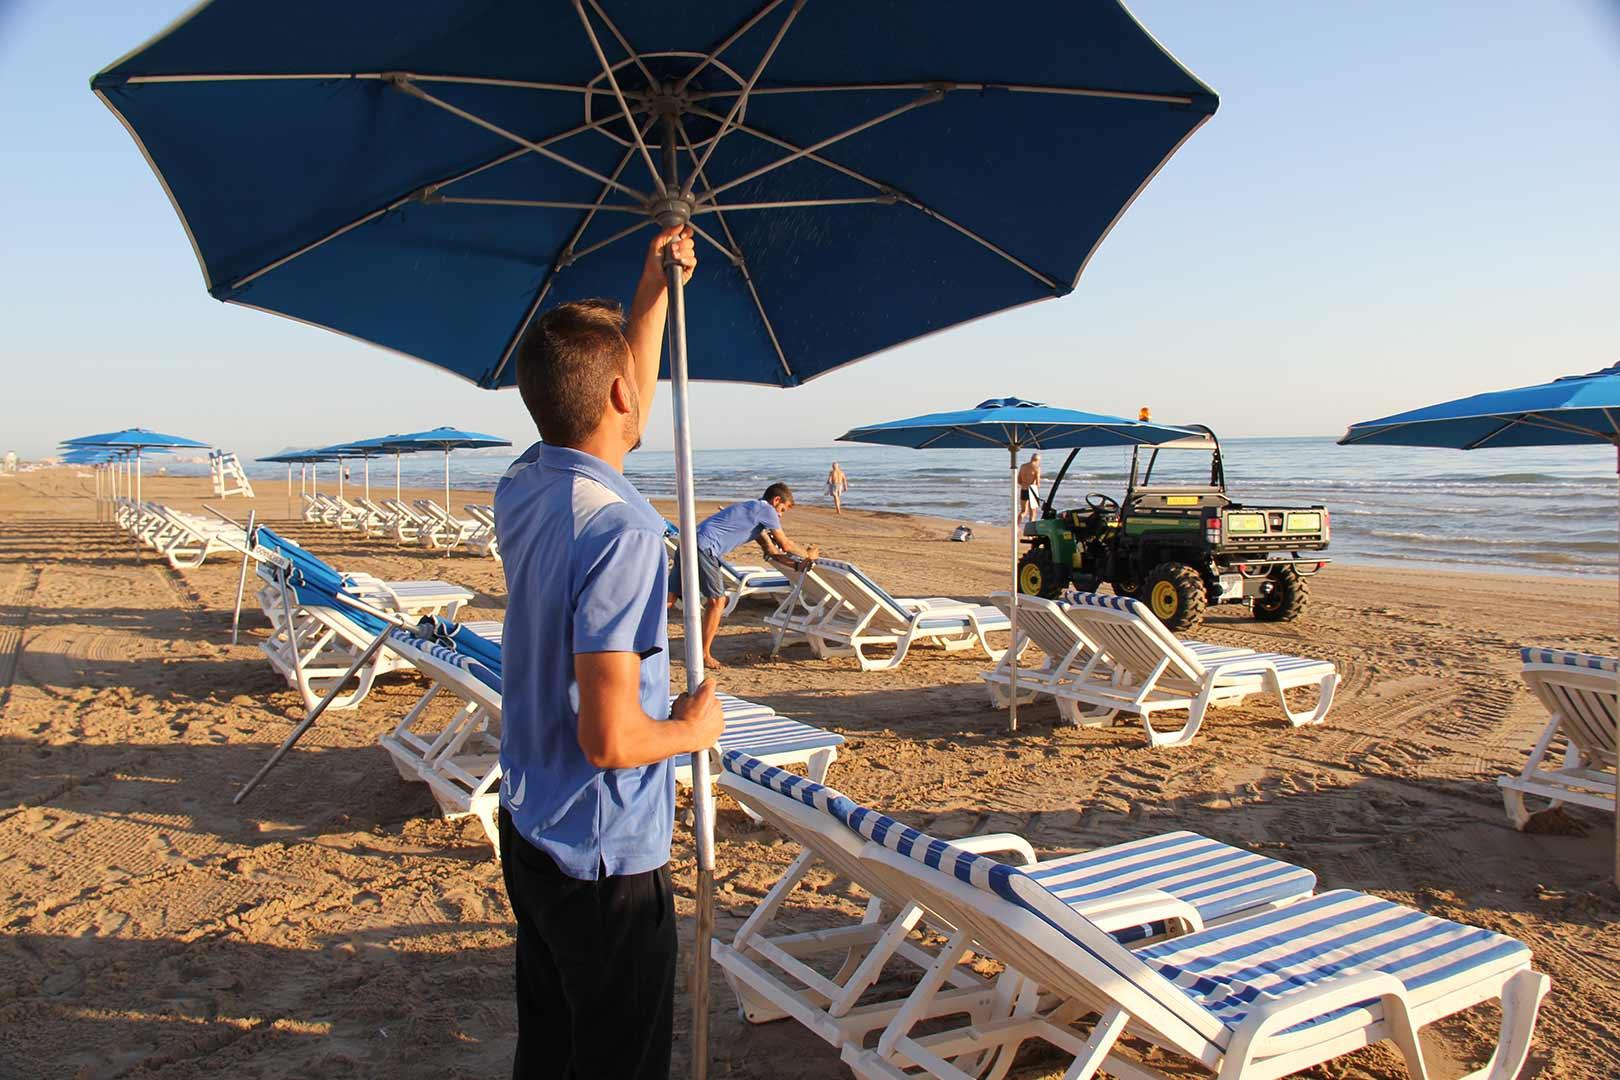 montaje-sombrillas-playa-ducalplaya